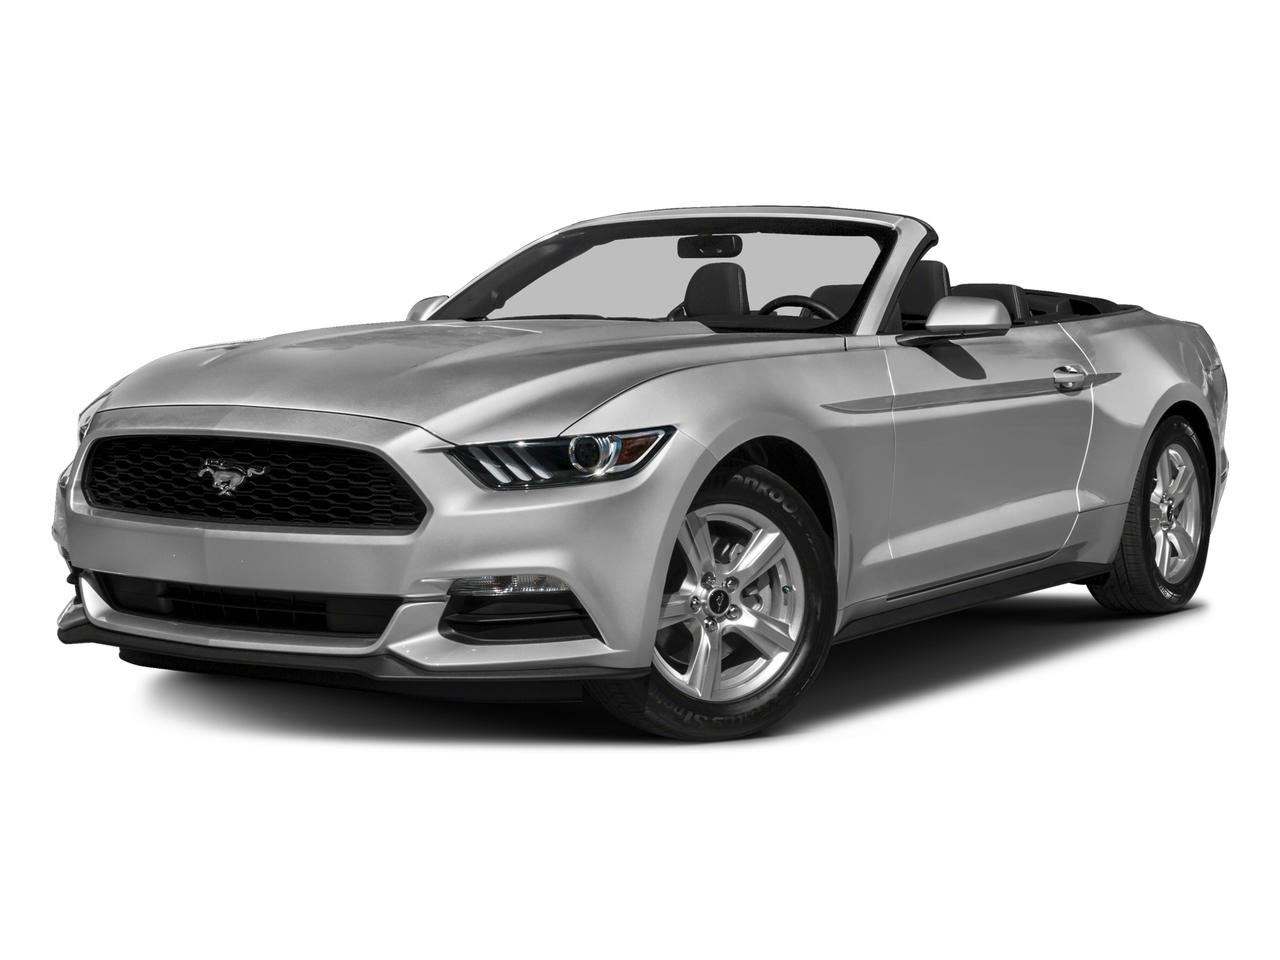 2016 Ford Mustang Vehicle Photo in JASPER, GA 30143-8655